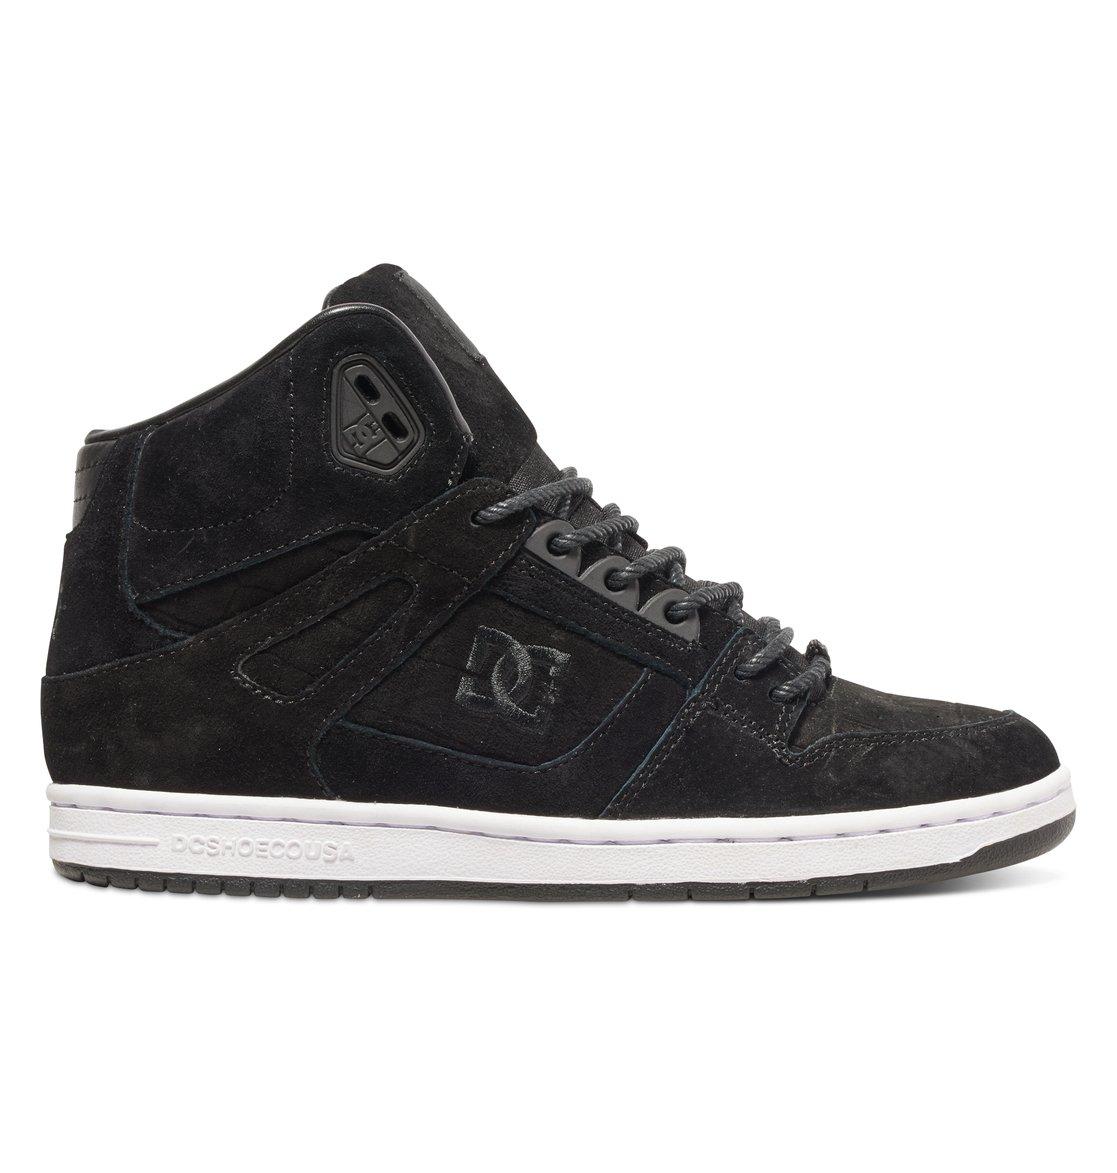 Rebound High XE Skate Shoe